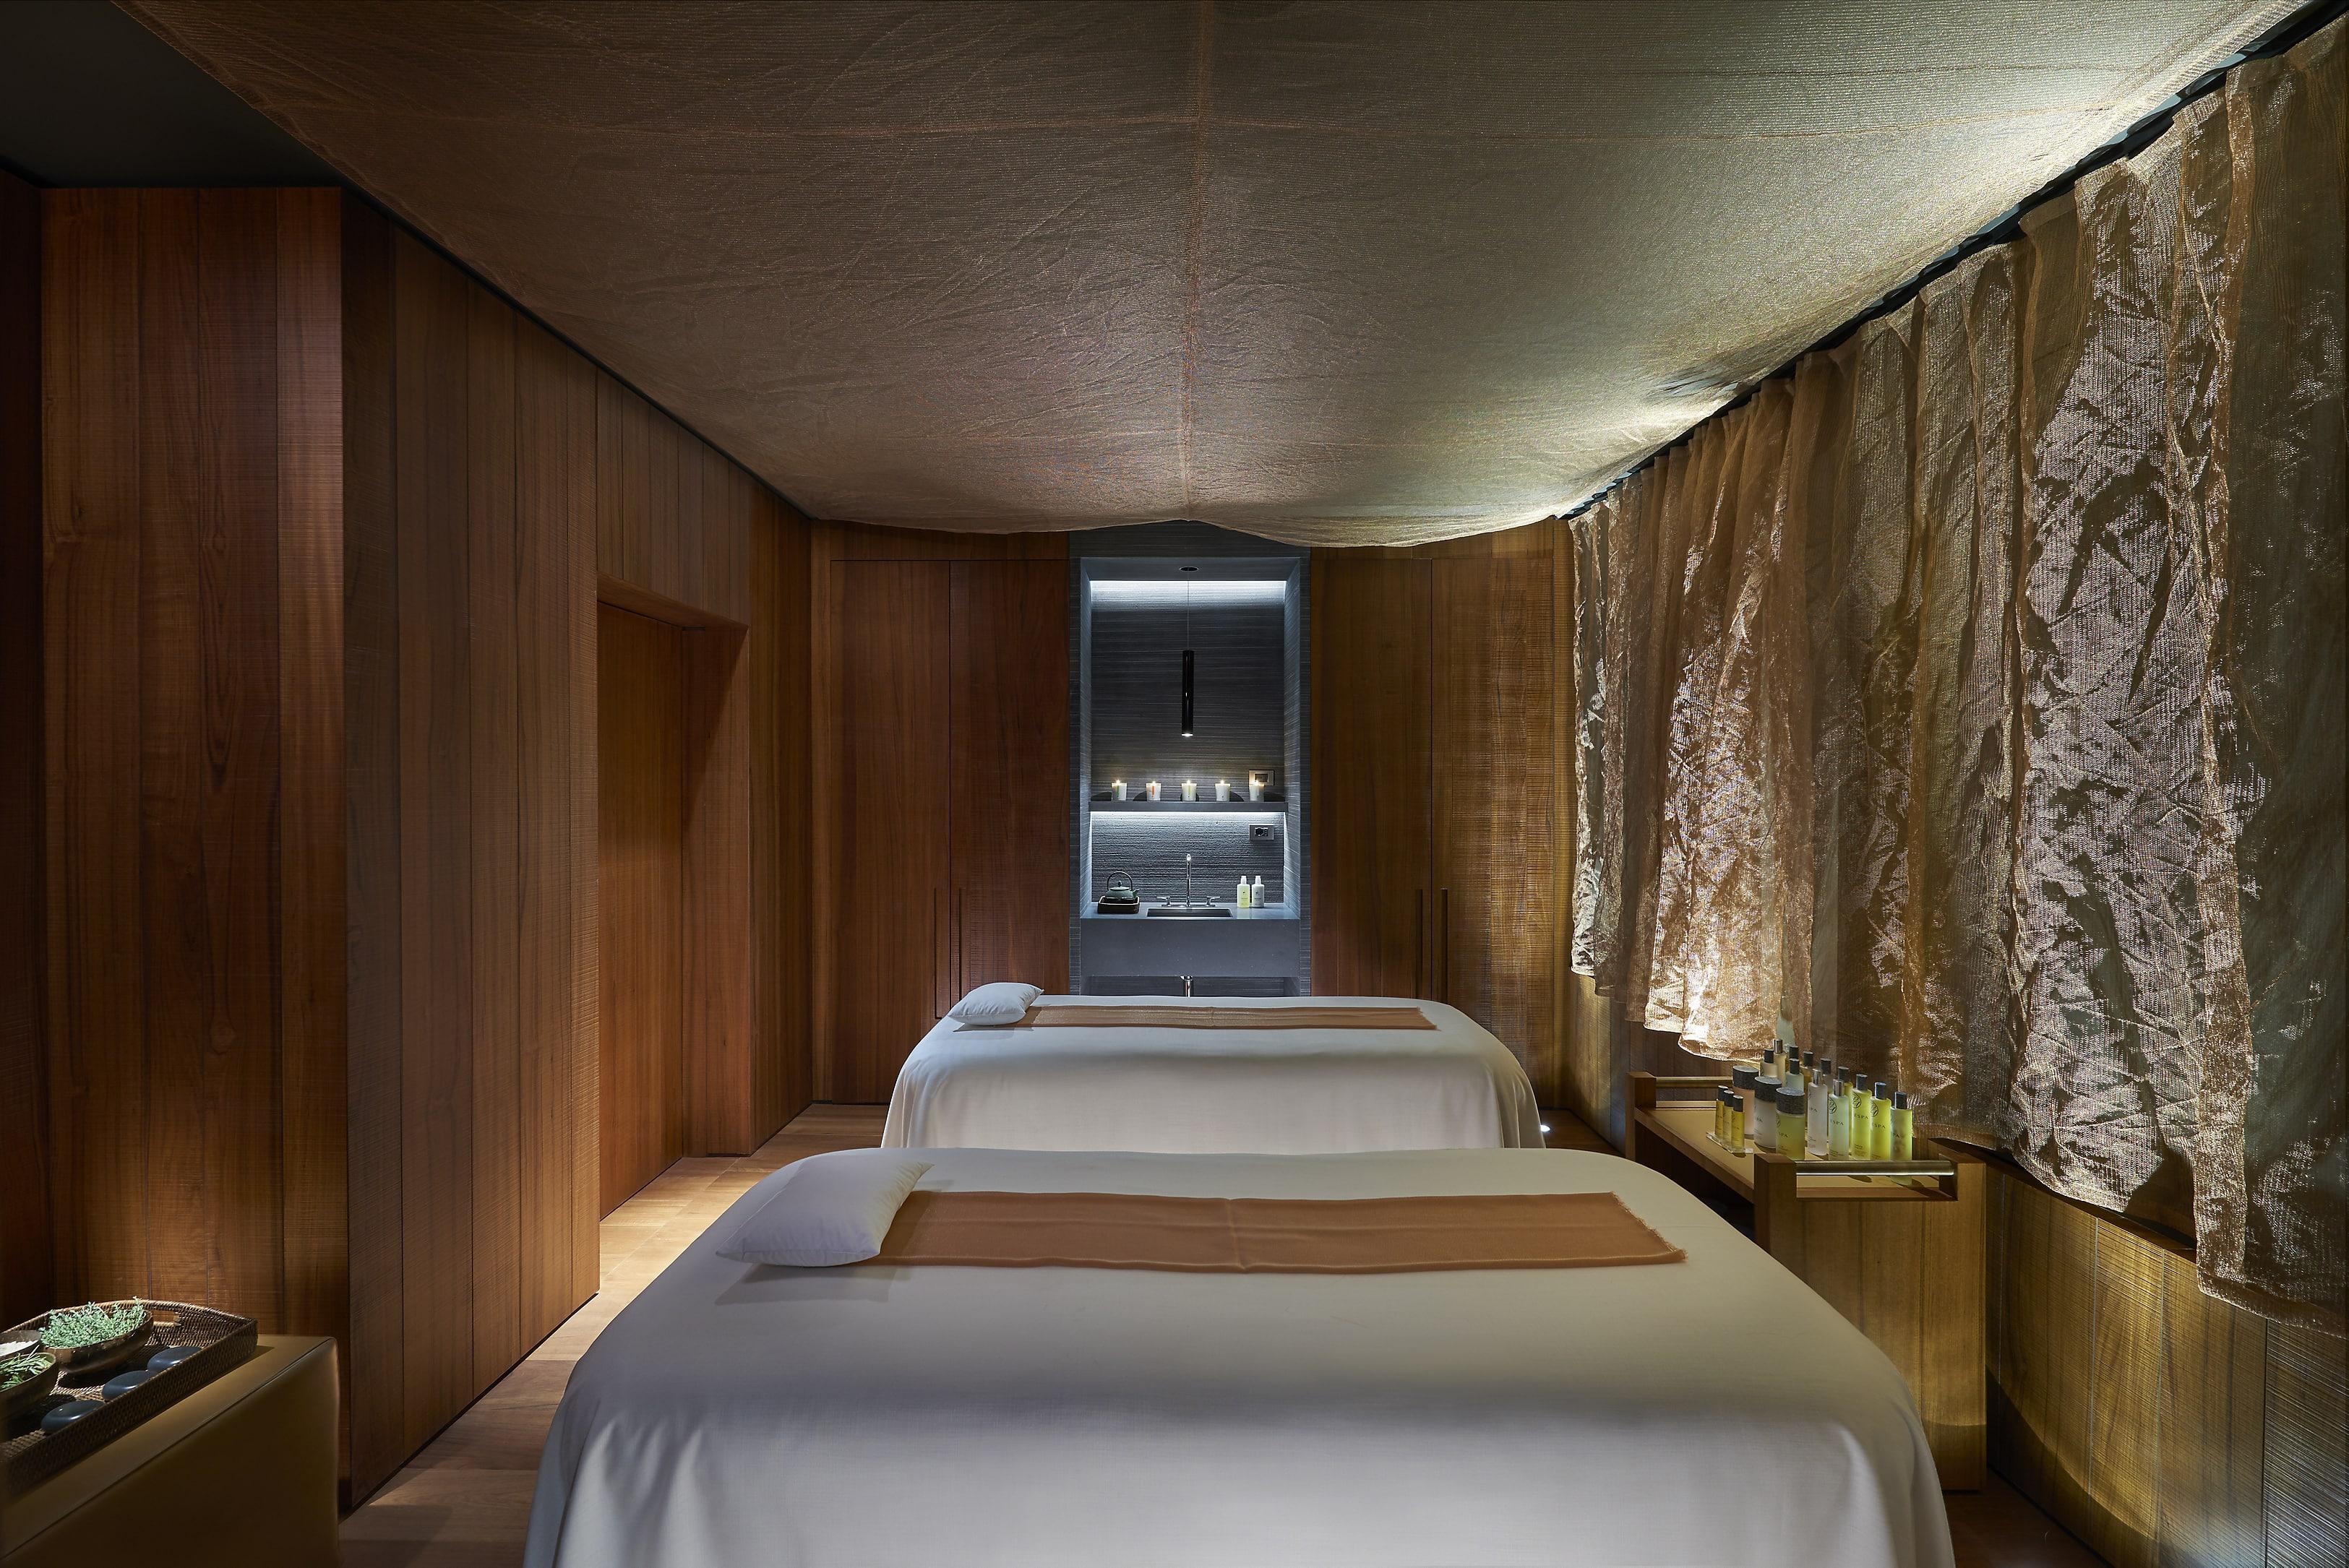 galleria foto hotel milano hotel mandarin oriental milano. Black Bedroom Furniture Sets. Home Design Ideas